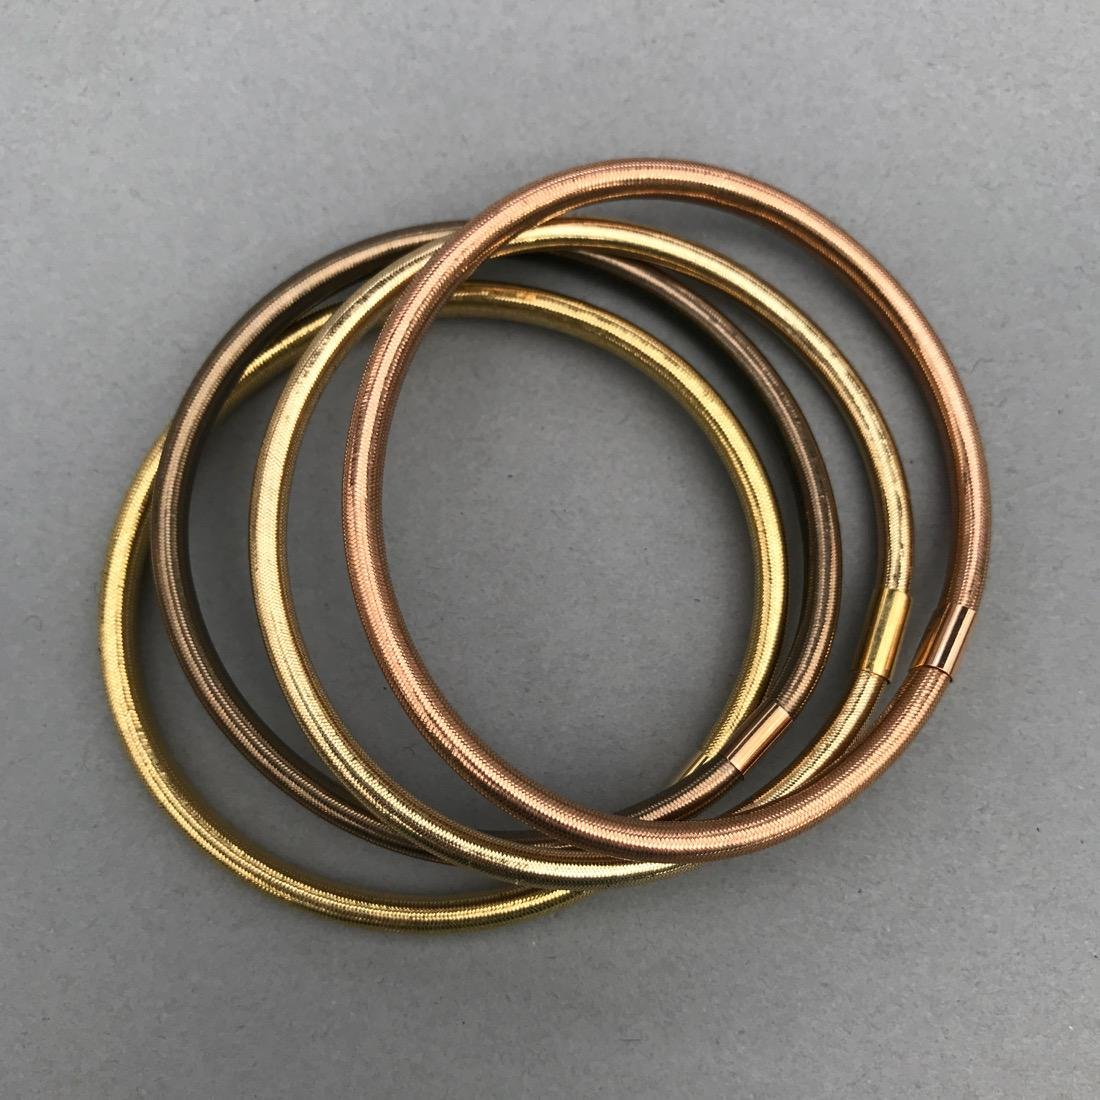 4 14K Gold Woven Flexible Bangle Bracelets